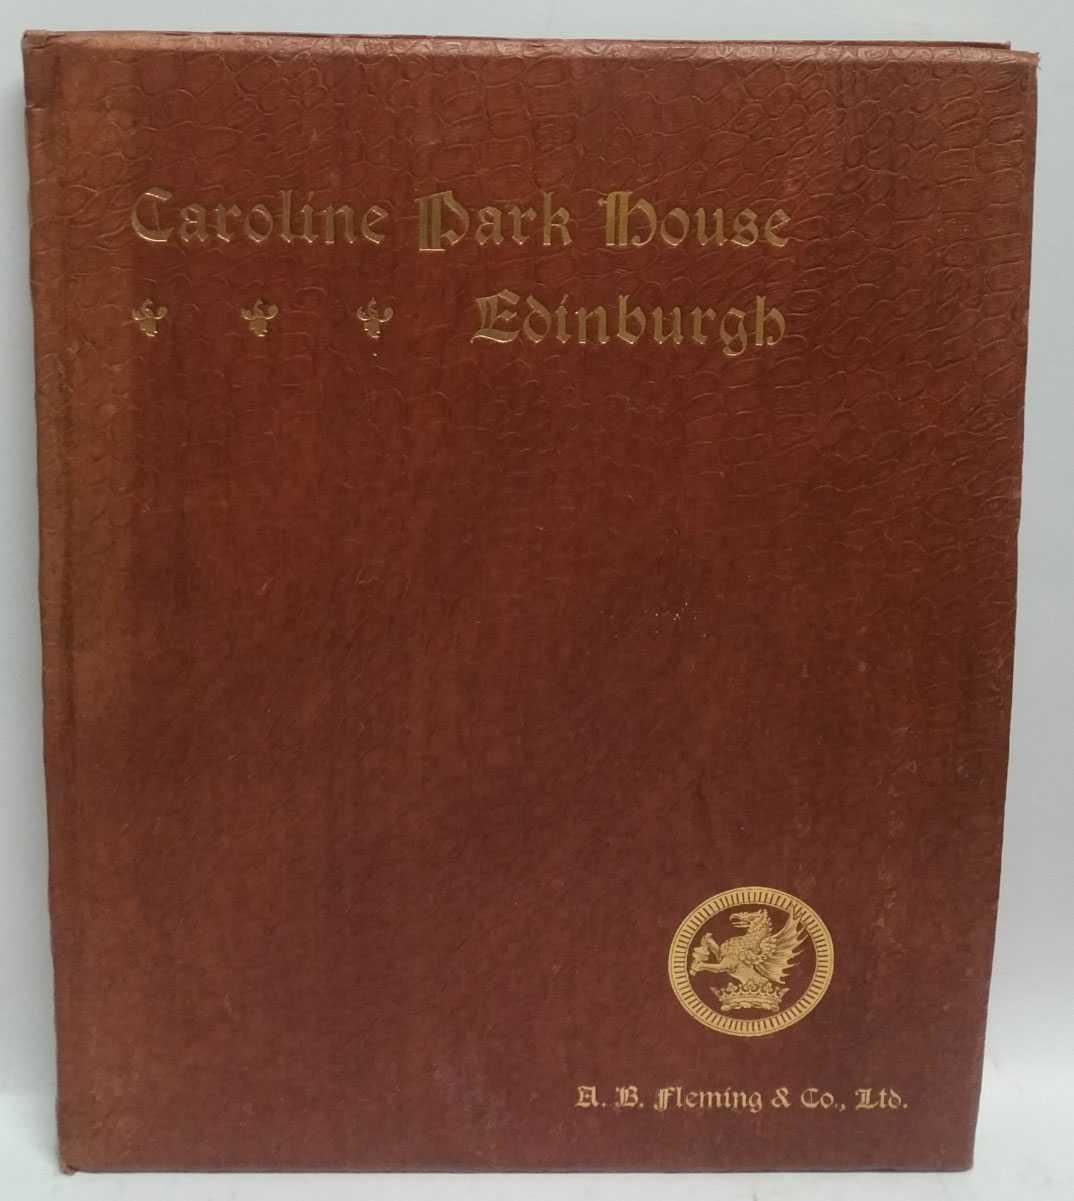 Caroline Park House and Roystoun Castle: A Descriptive and Historical Account, David Fraser Harris